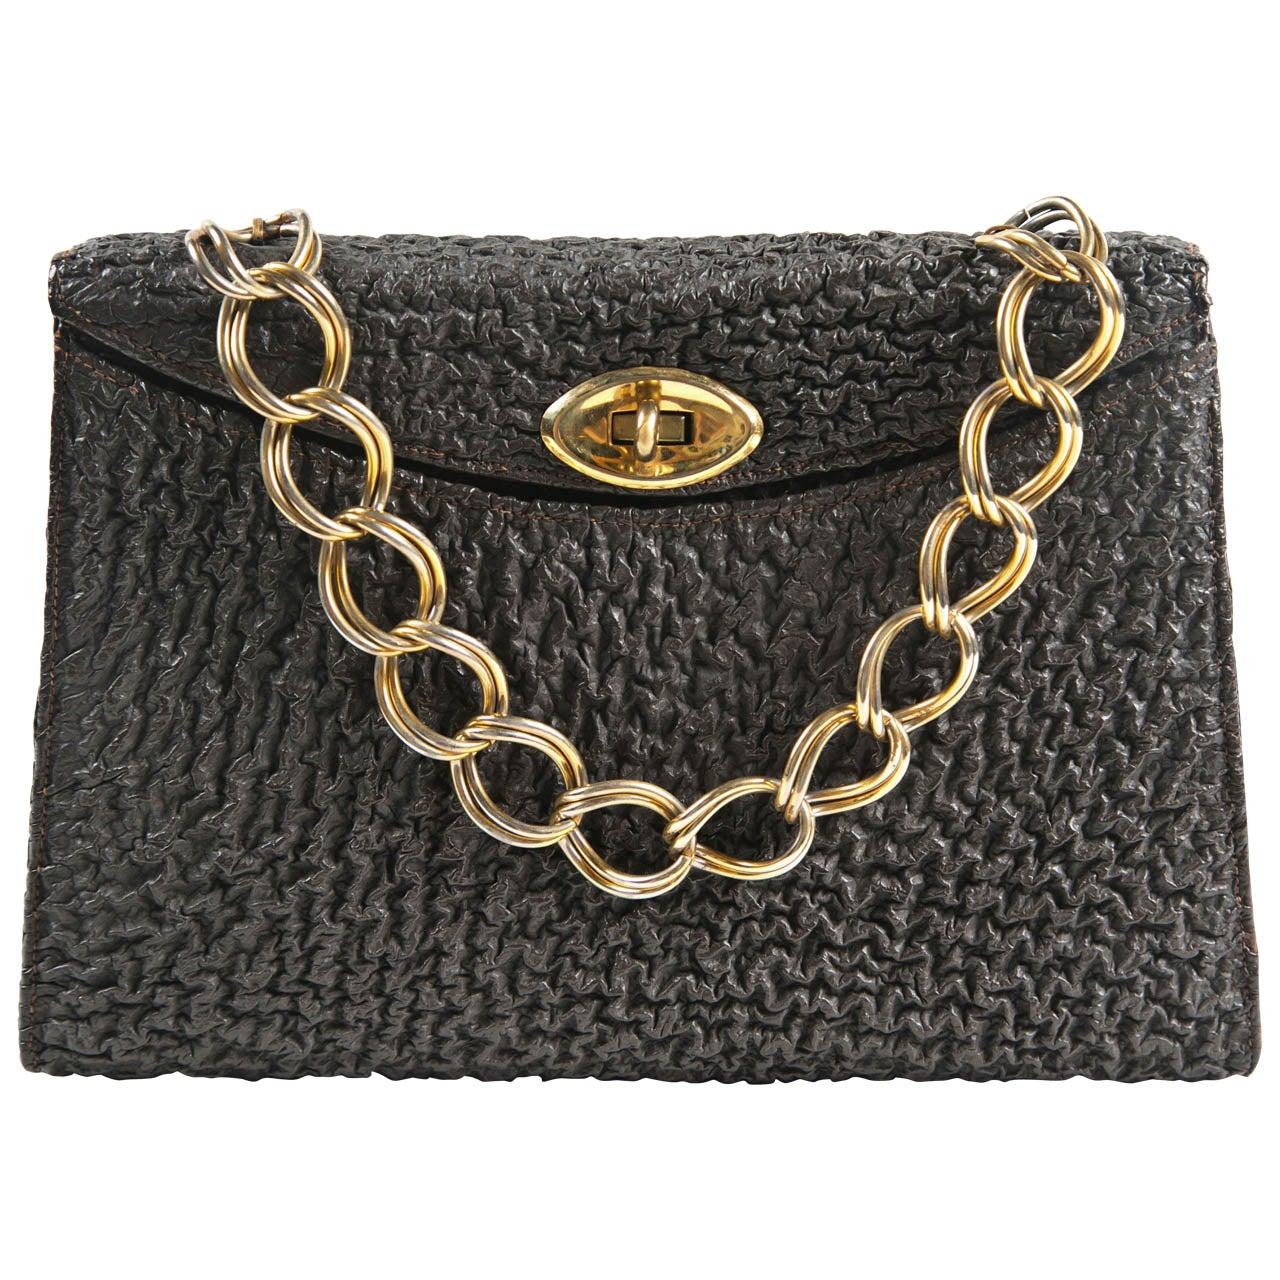 Jacomo Paris Wrinkled Leather Handbag 1